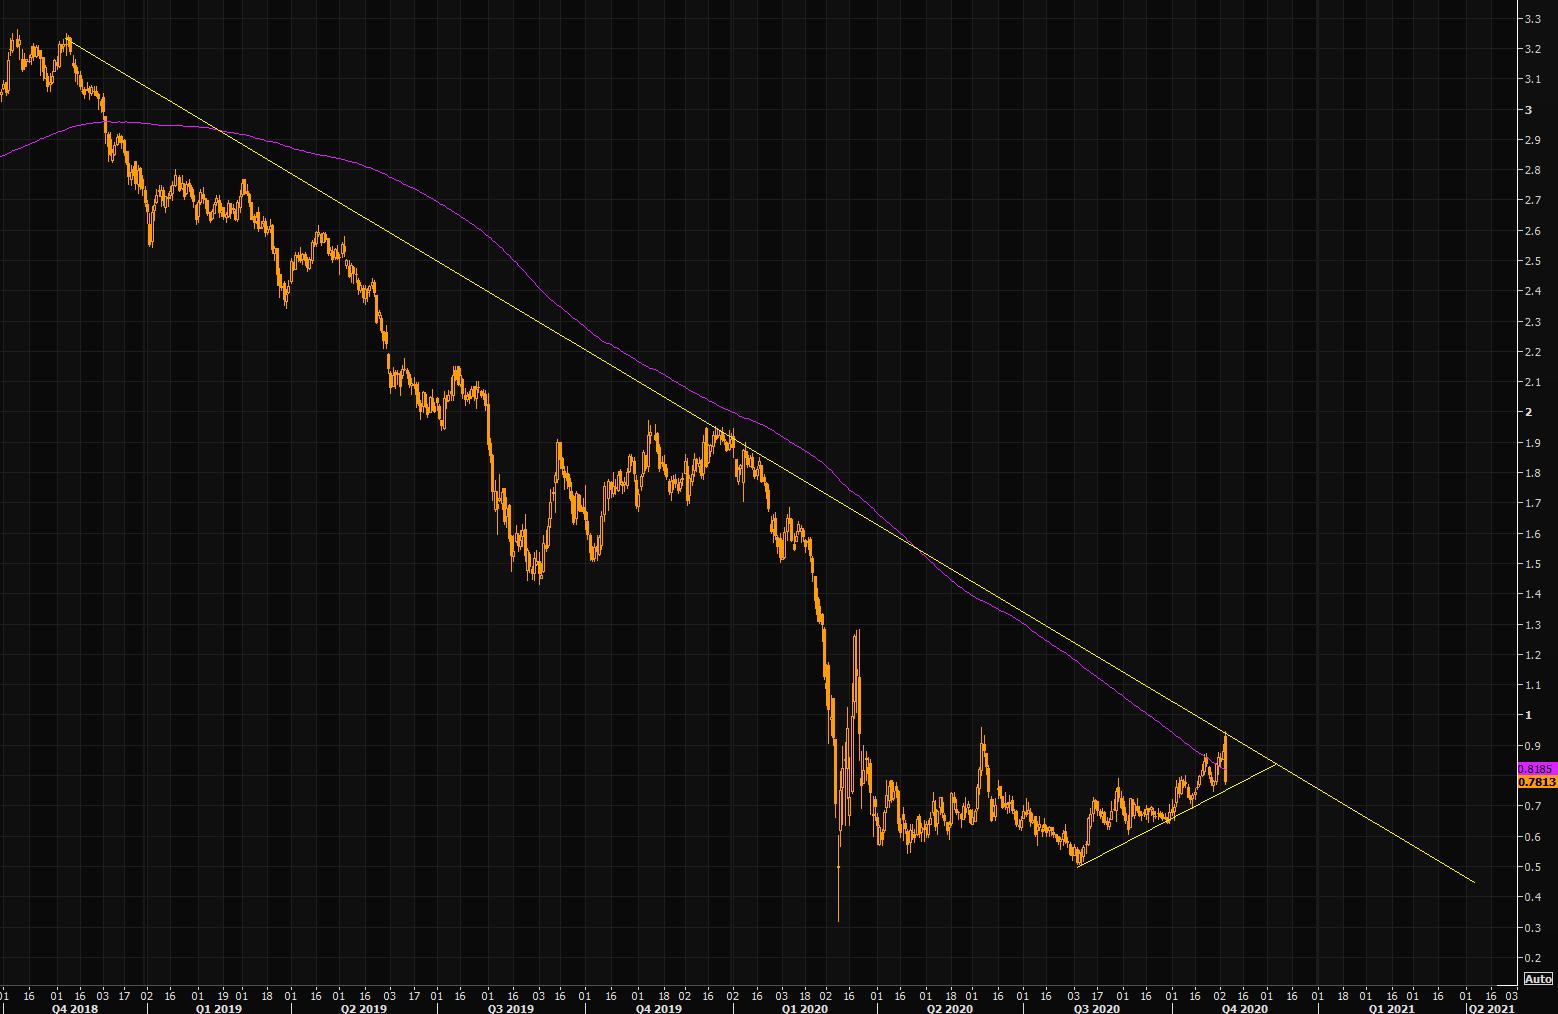 U.S 10-year yield chart